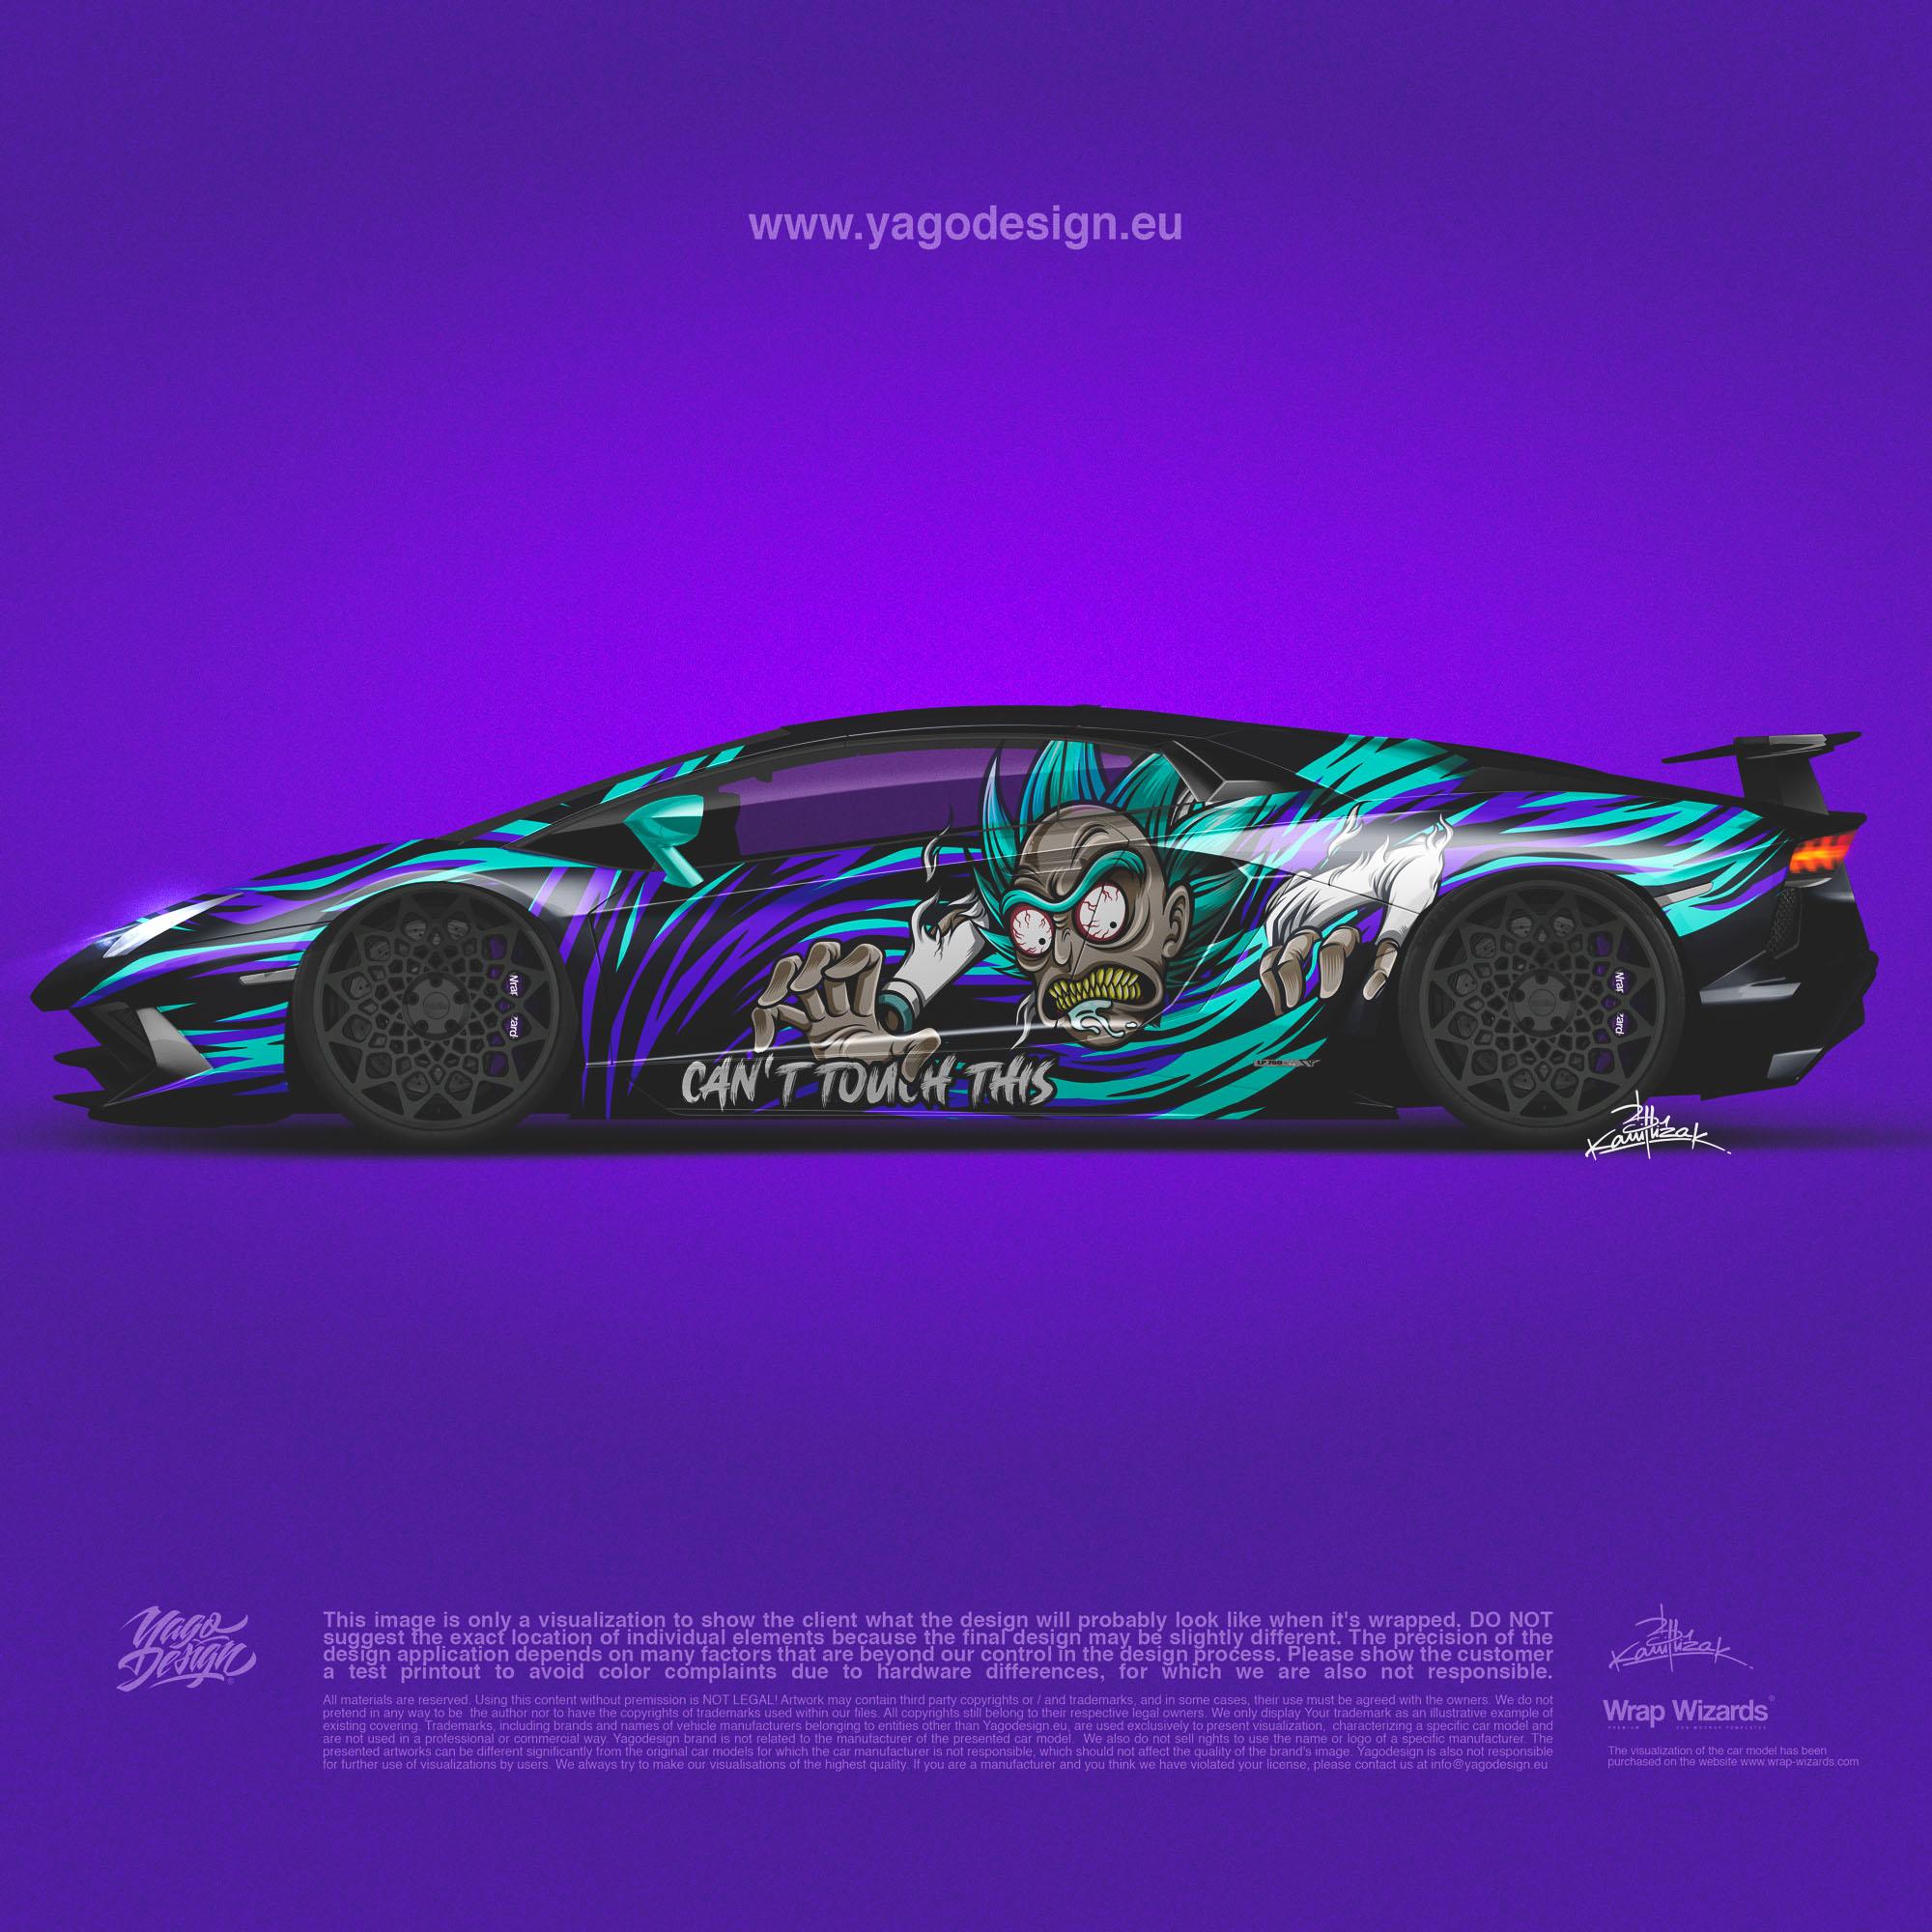 Lamborghini-Aventador-LP750-4-SV-Roadster-2016-sv1